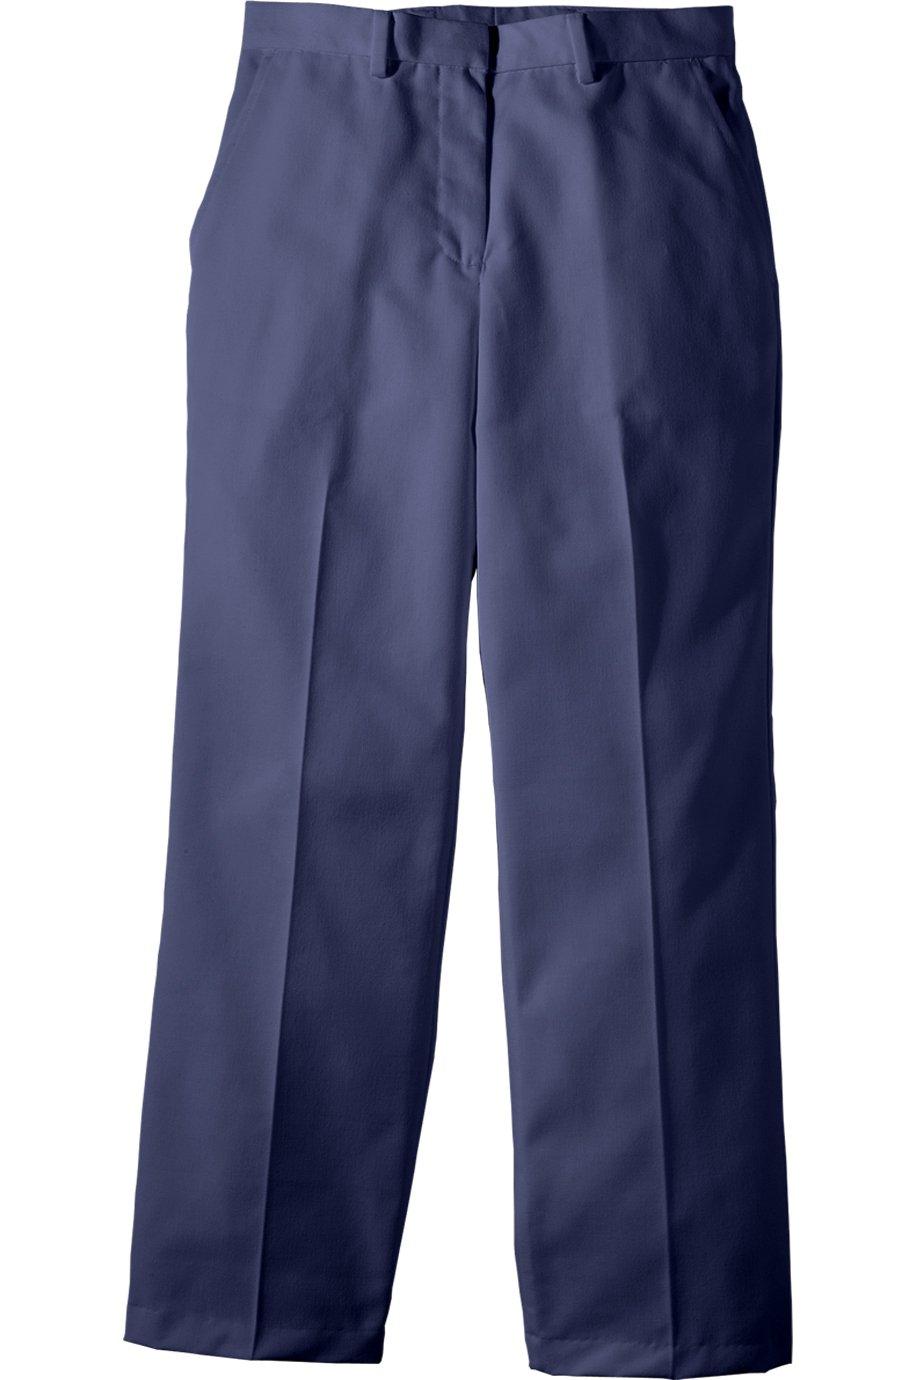 Edwards Garment Women's Straight Leg Flat Front Pant 8519